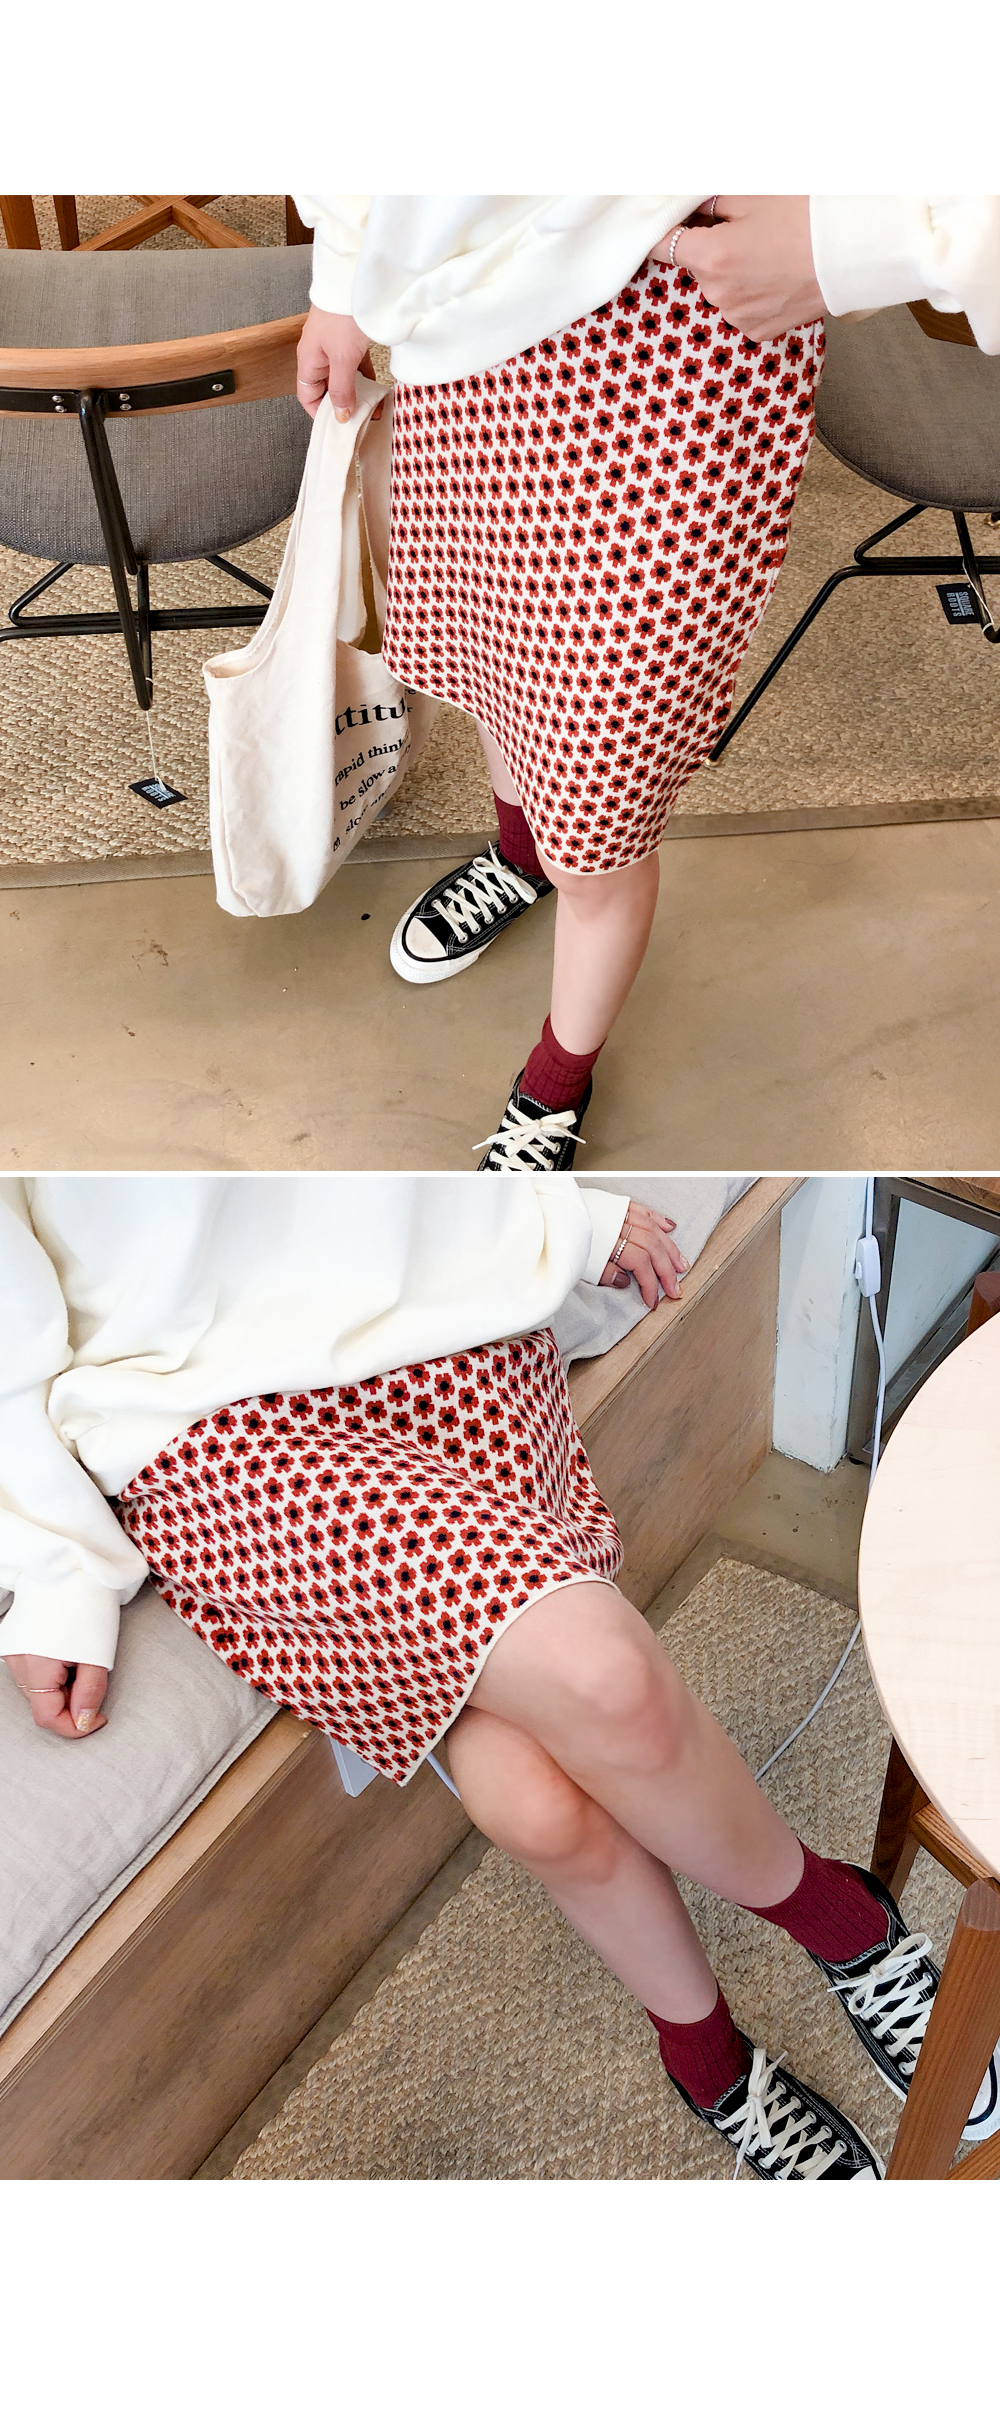 I want a flower skirt